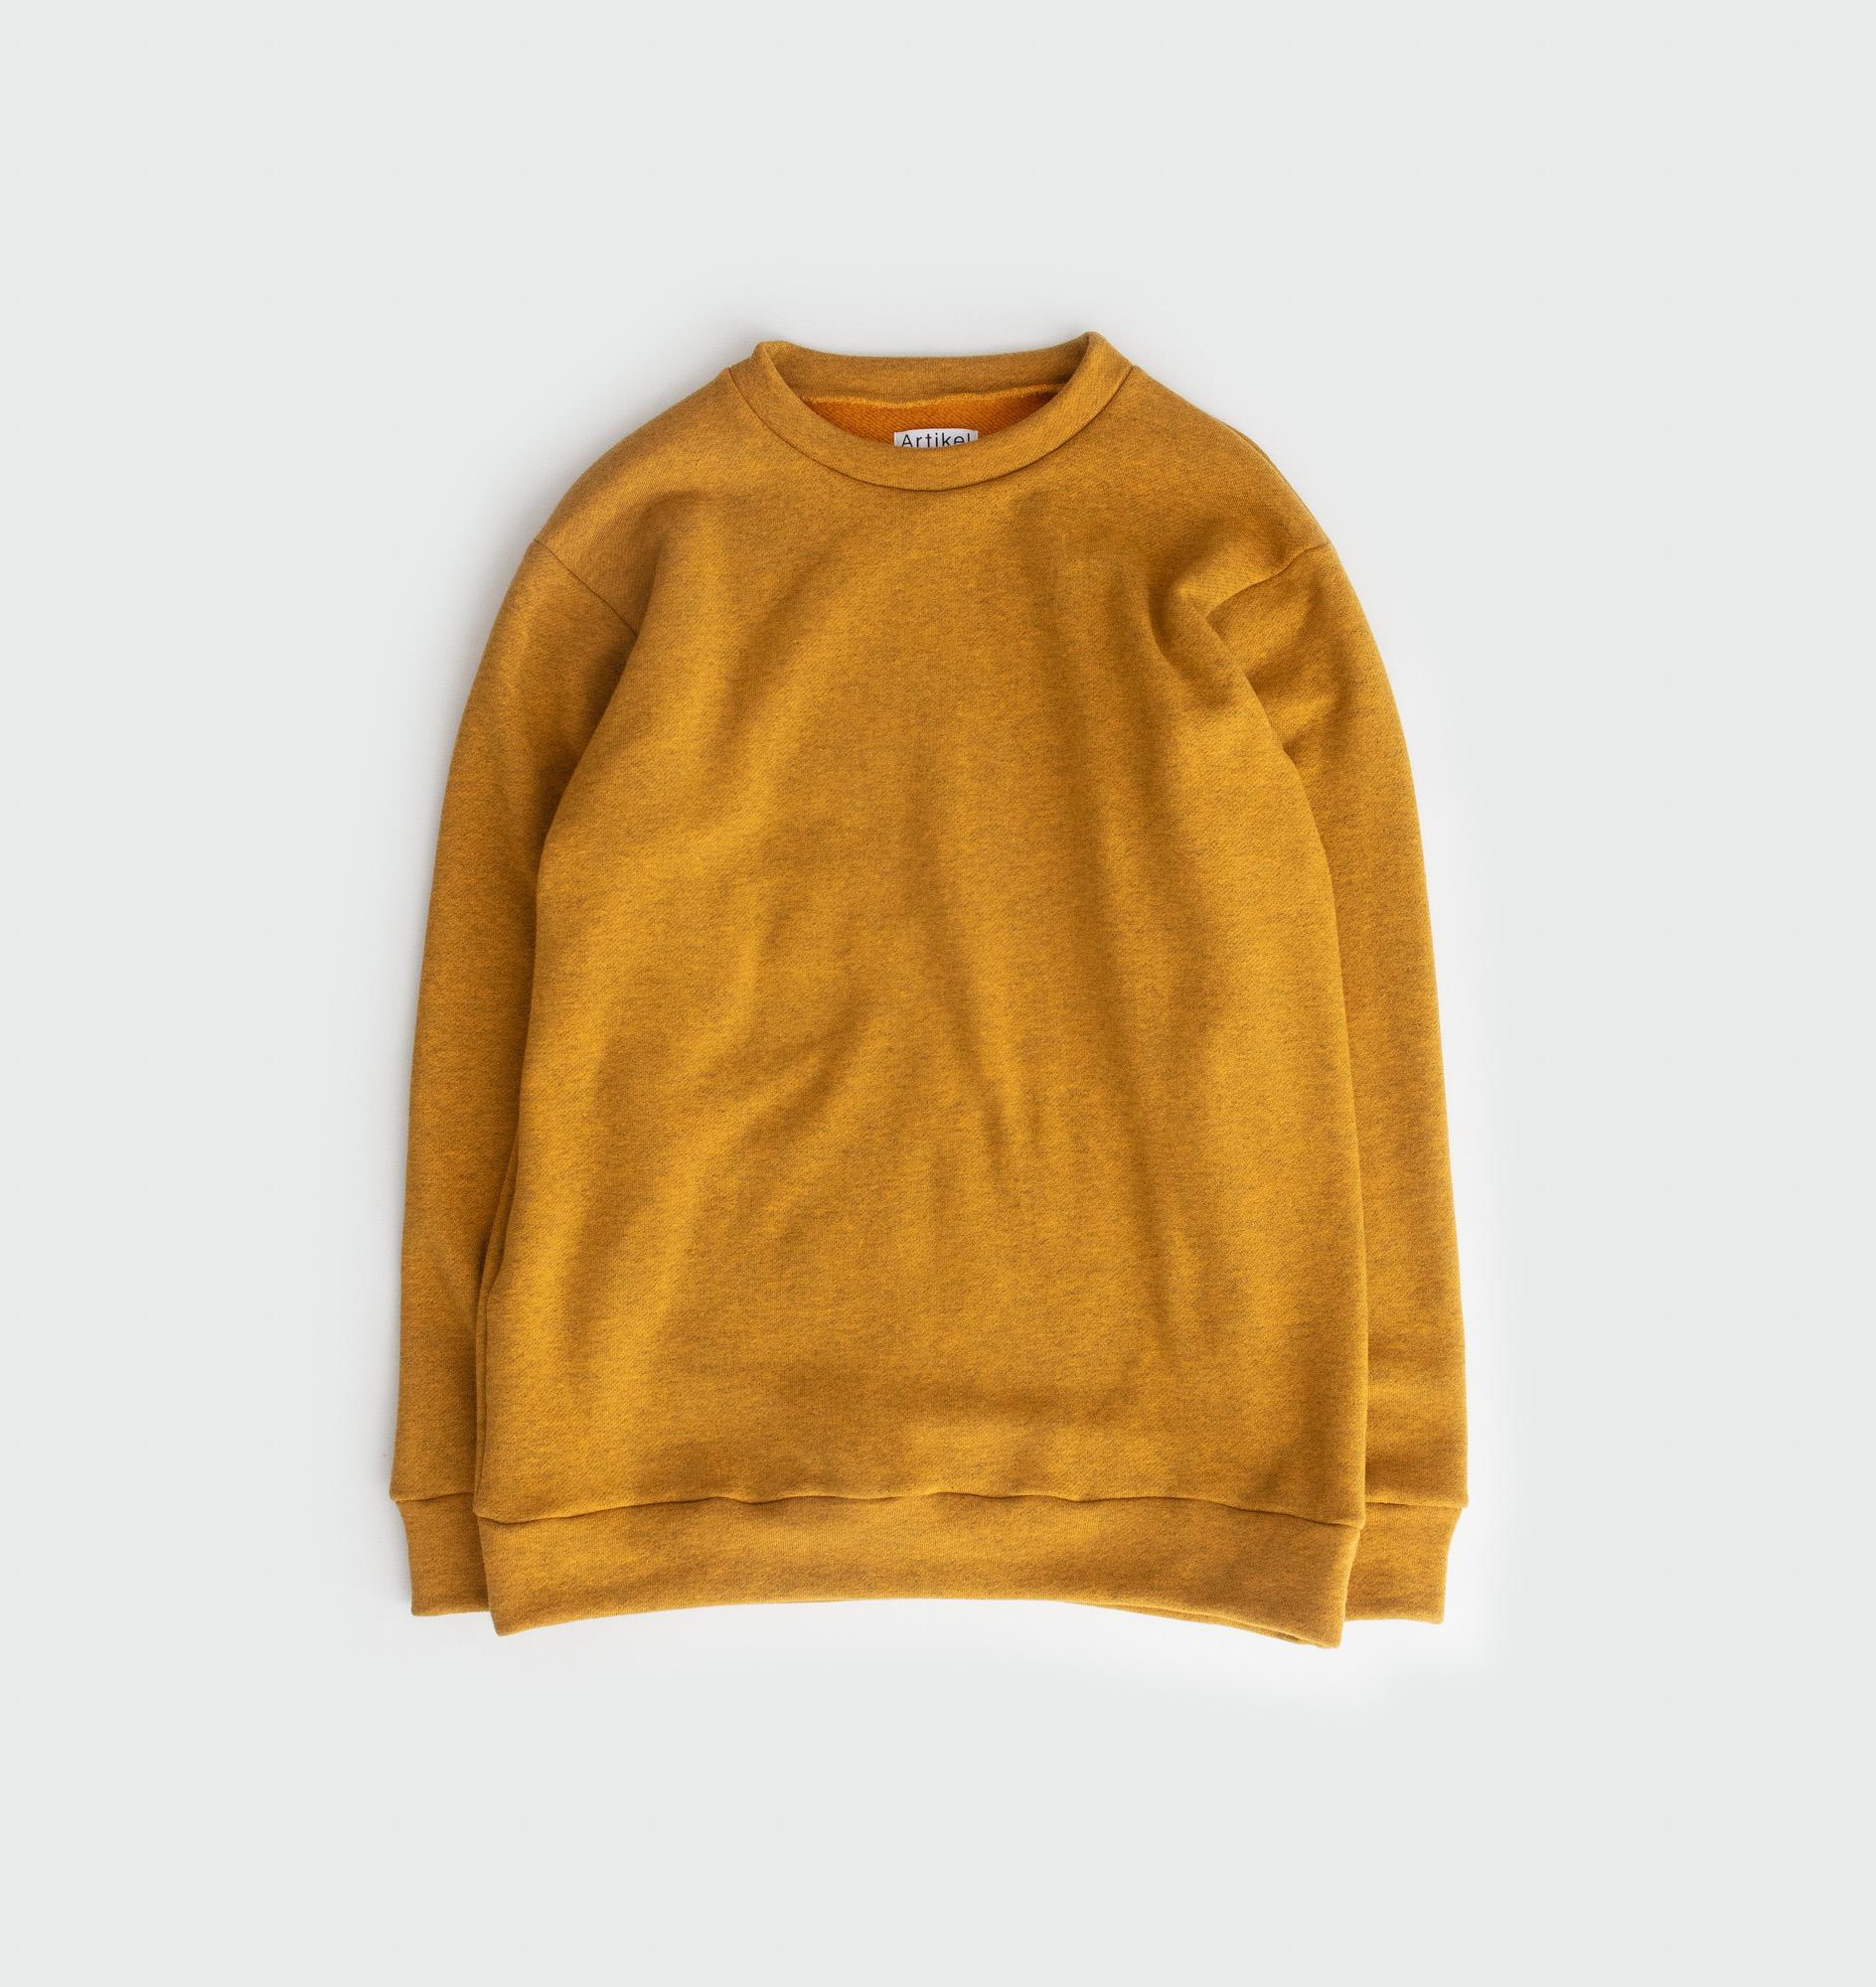 Overshirt or jacket by Artikel Store, Made In Copenhagen, Denmark